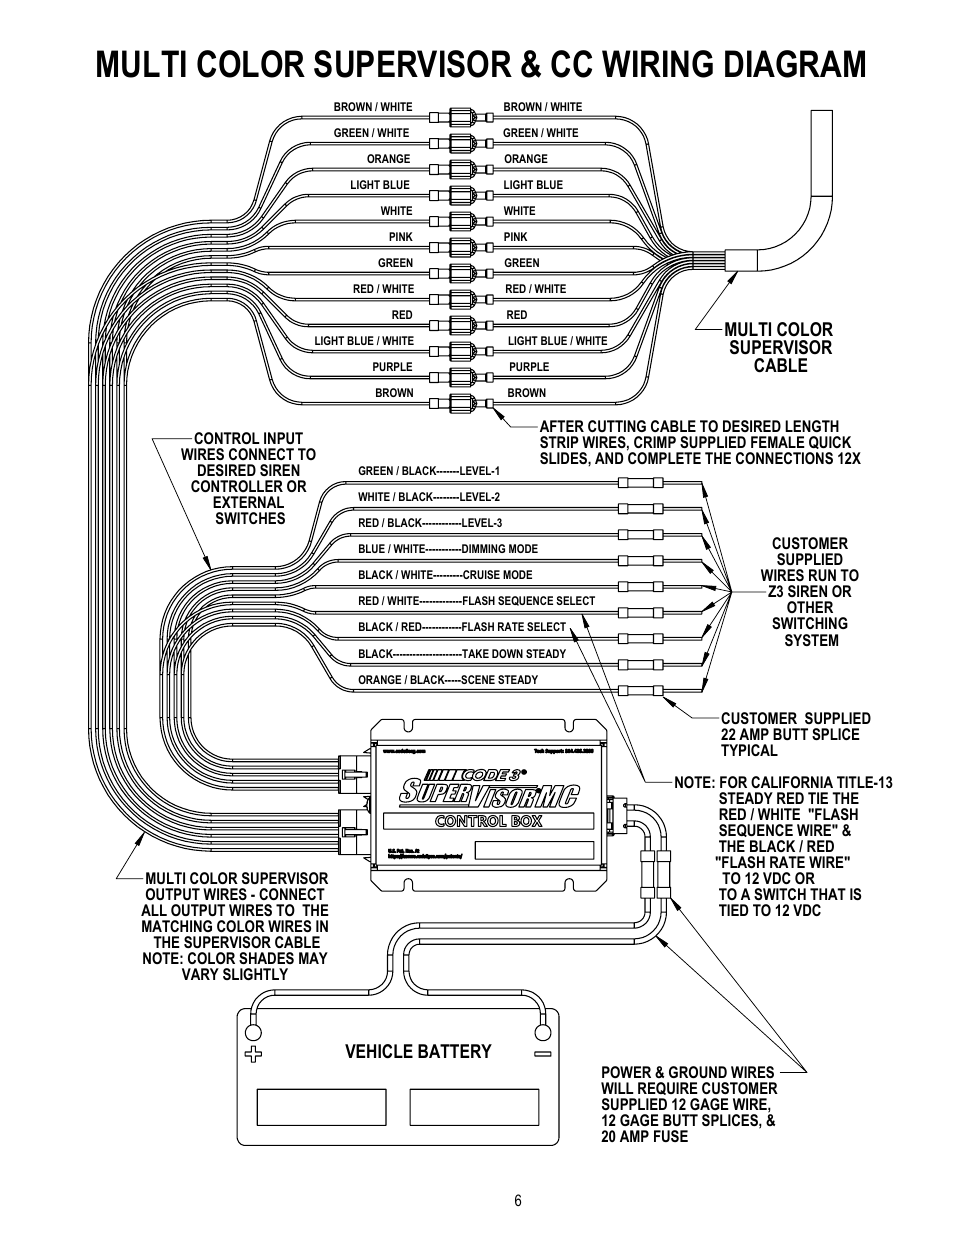 Galls Siren Wiring Diagram Remote 1985 Dodge Ram Fuse Box Code 3 Detailed Diagrams On